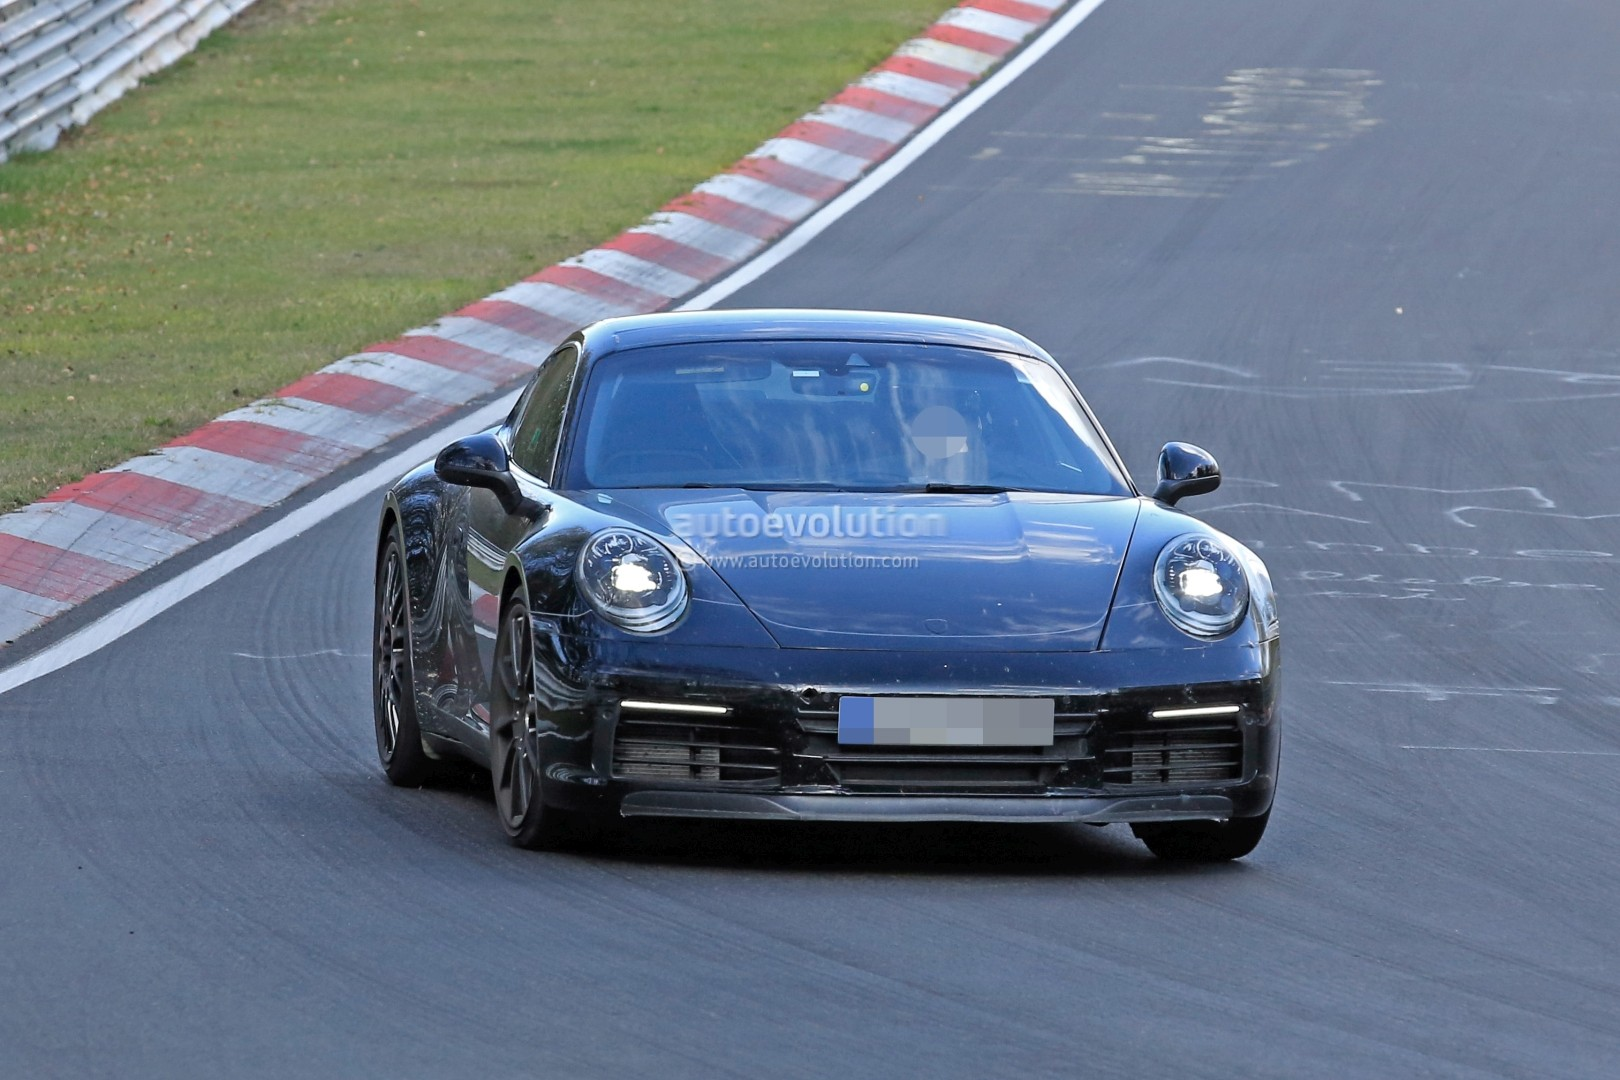 2018 - [Porsche] 911 - Page 3 New-2019-porsche-911-makes-nurburgring-debut-prototype-has-mysterios-fuel-door_2